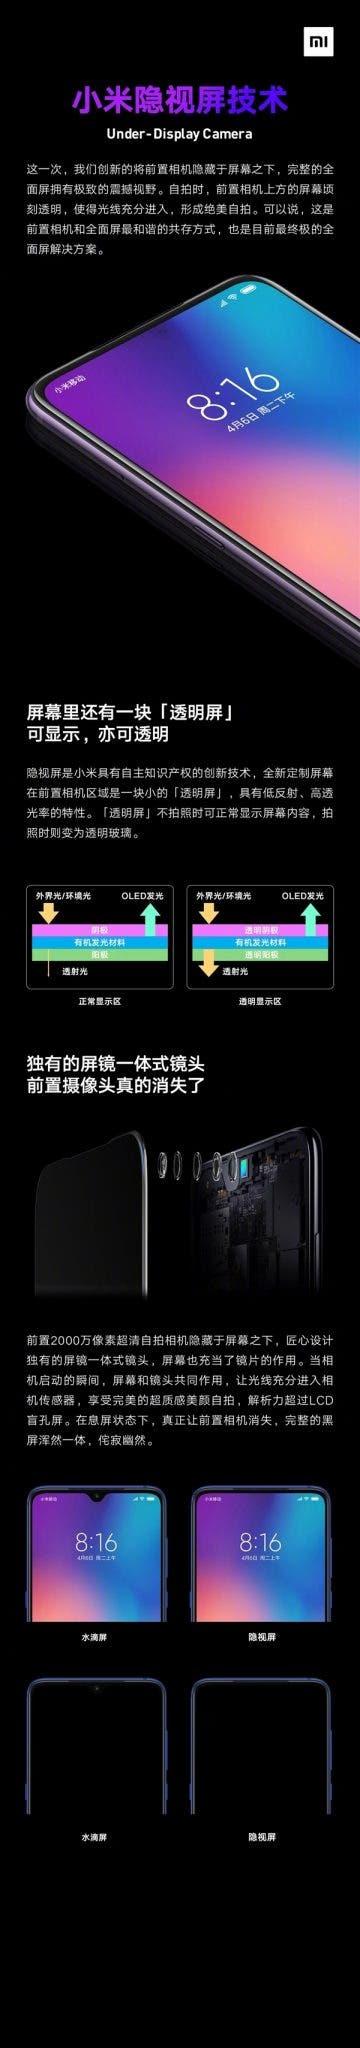 Xiaomi screen camera technology